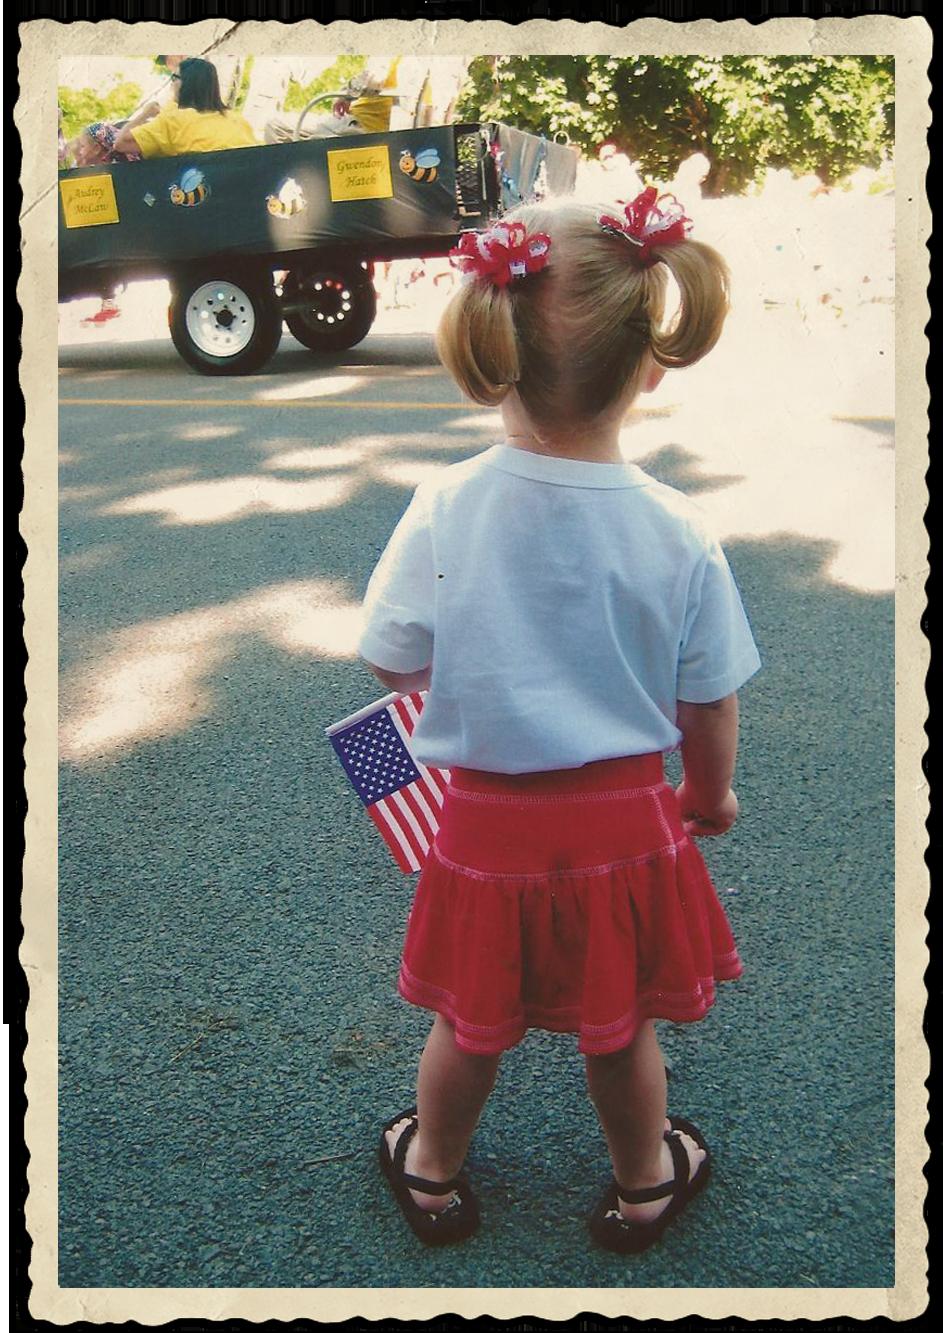 Patriotic spirit! www.mytributejournal.com